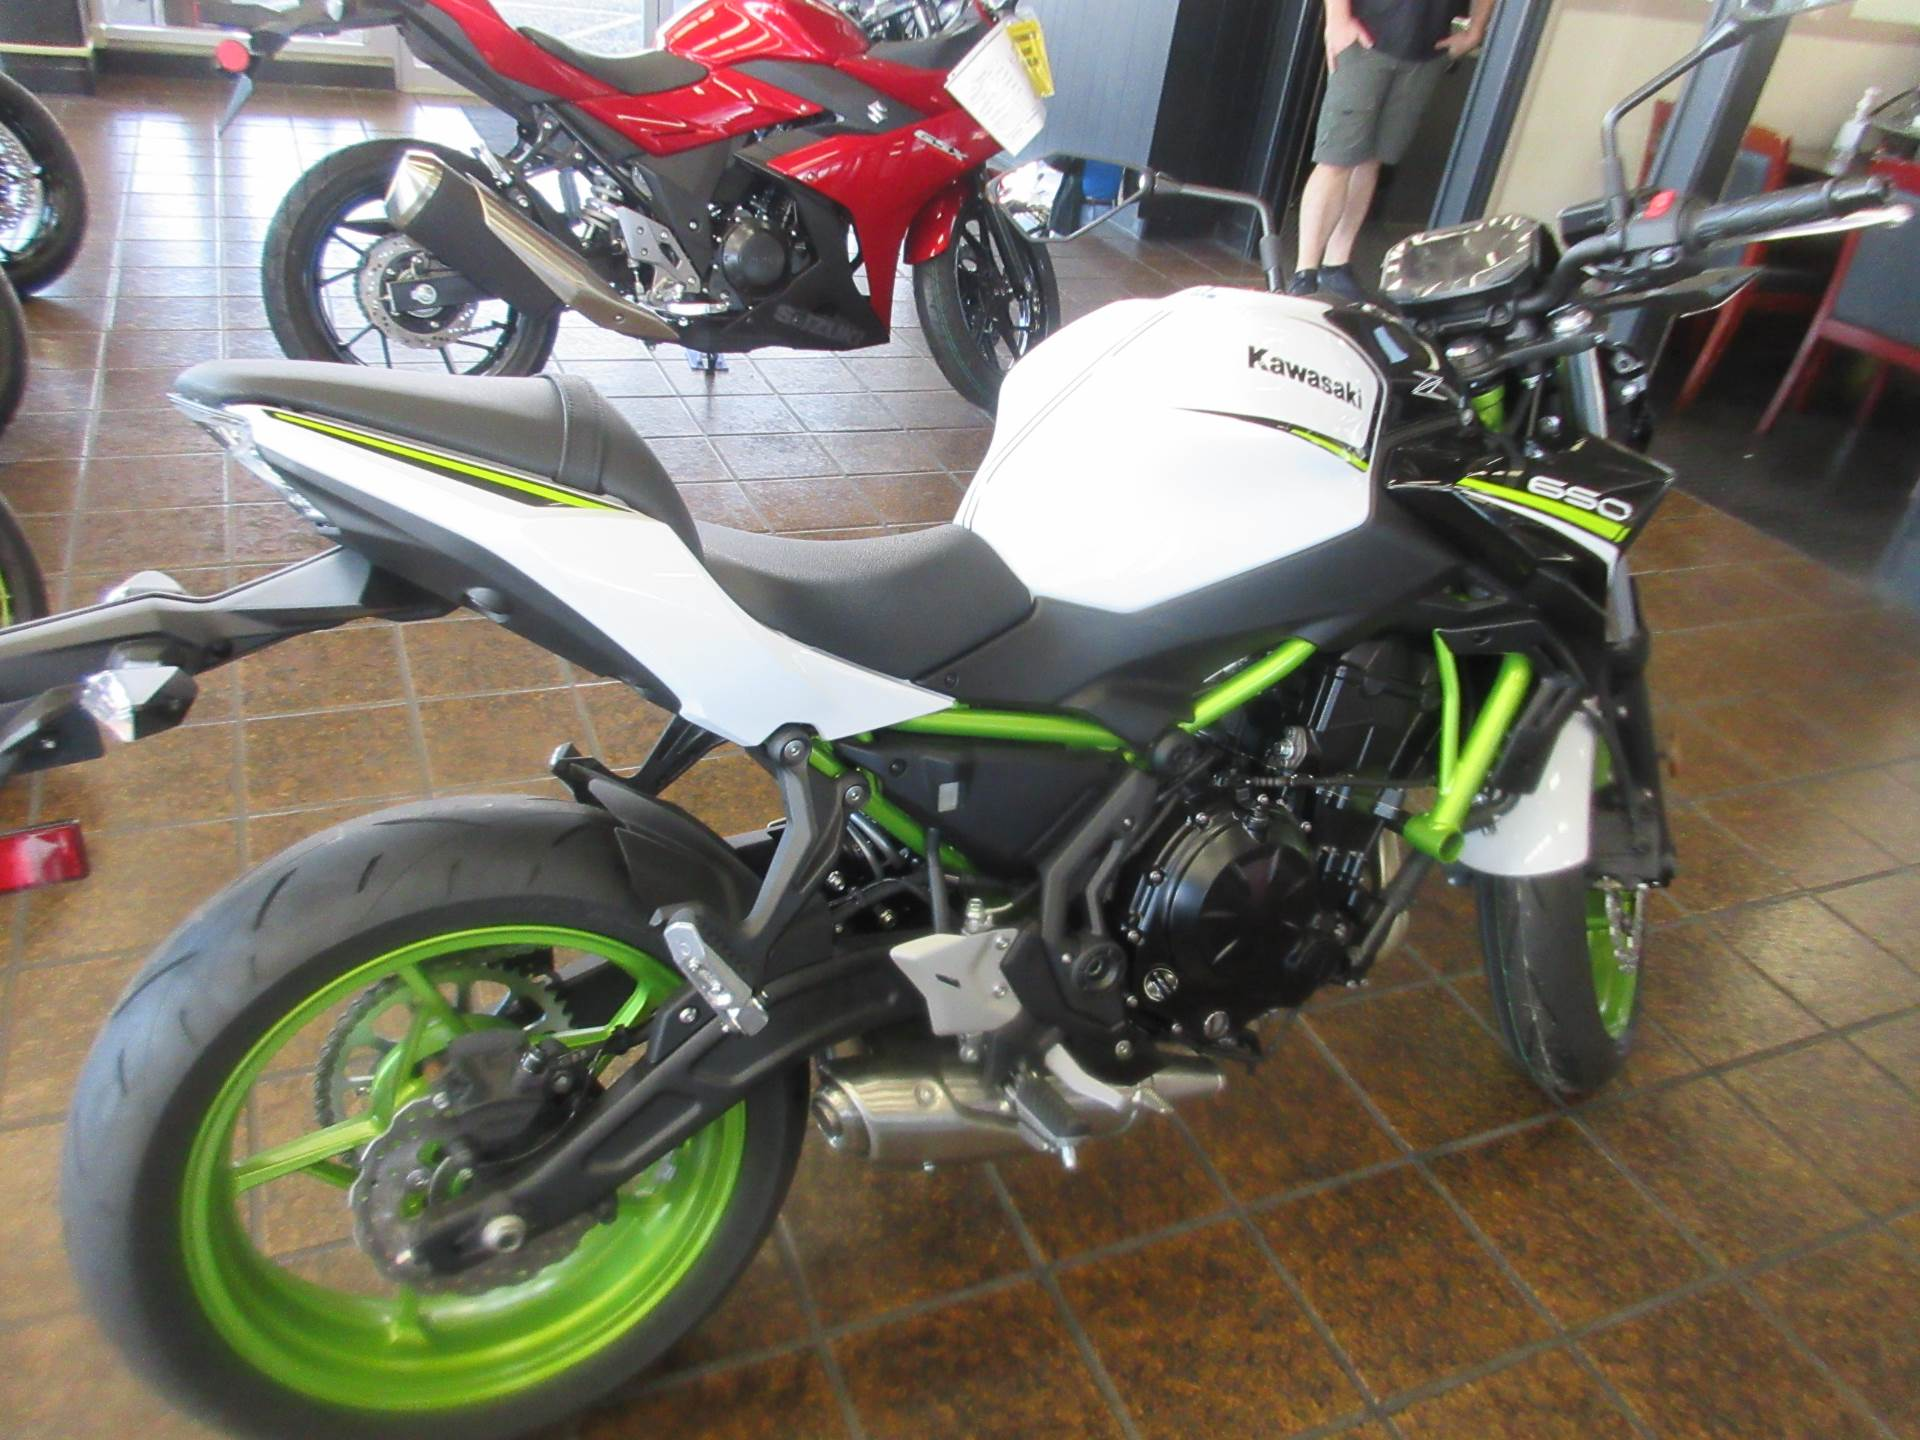 New 2021 Kawasaki Z650 ABS Motorcycles in Bellevue, WA